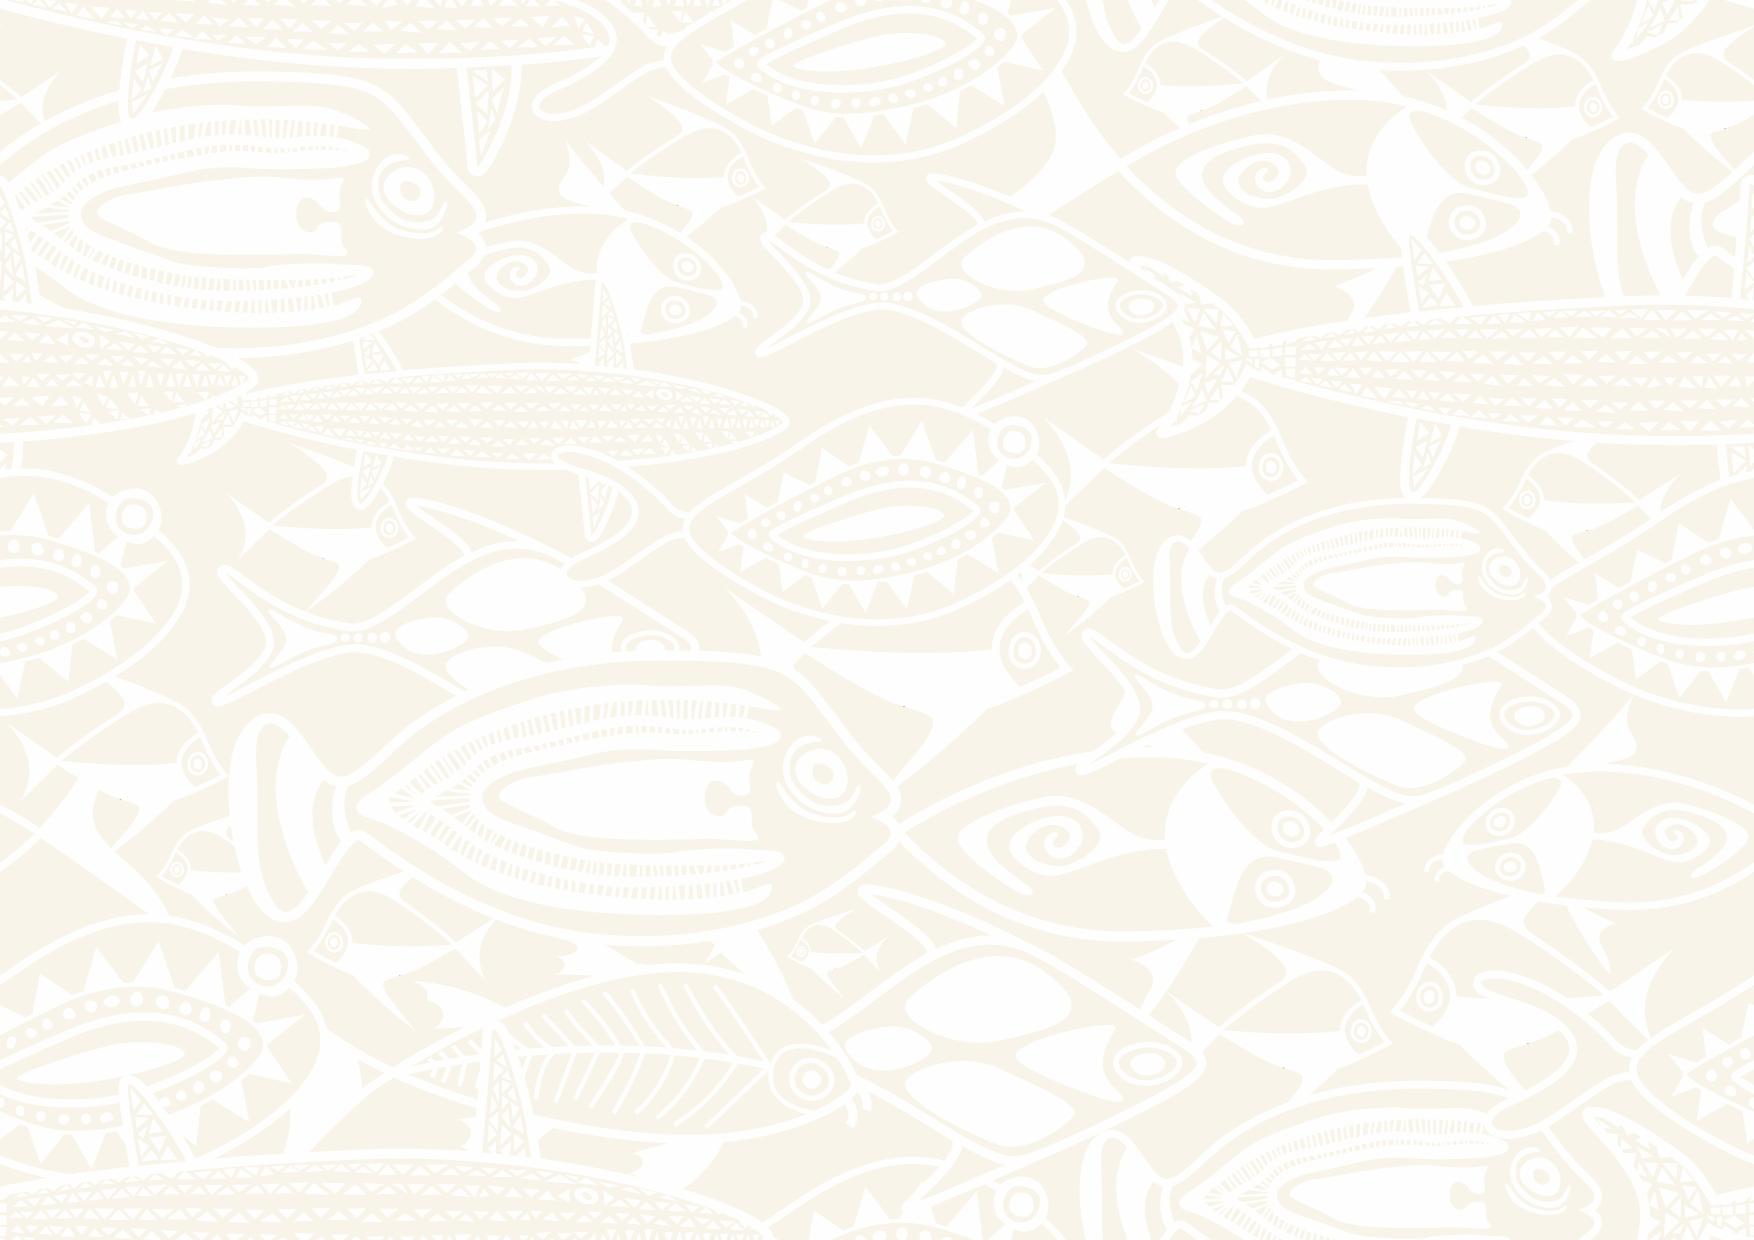 background illustrations for Biodiversity Raja Ampat